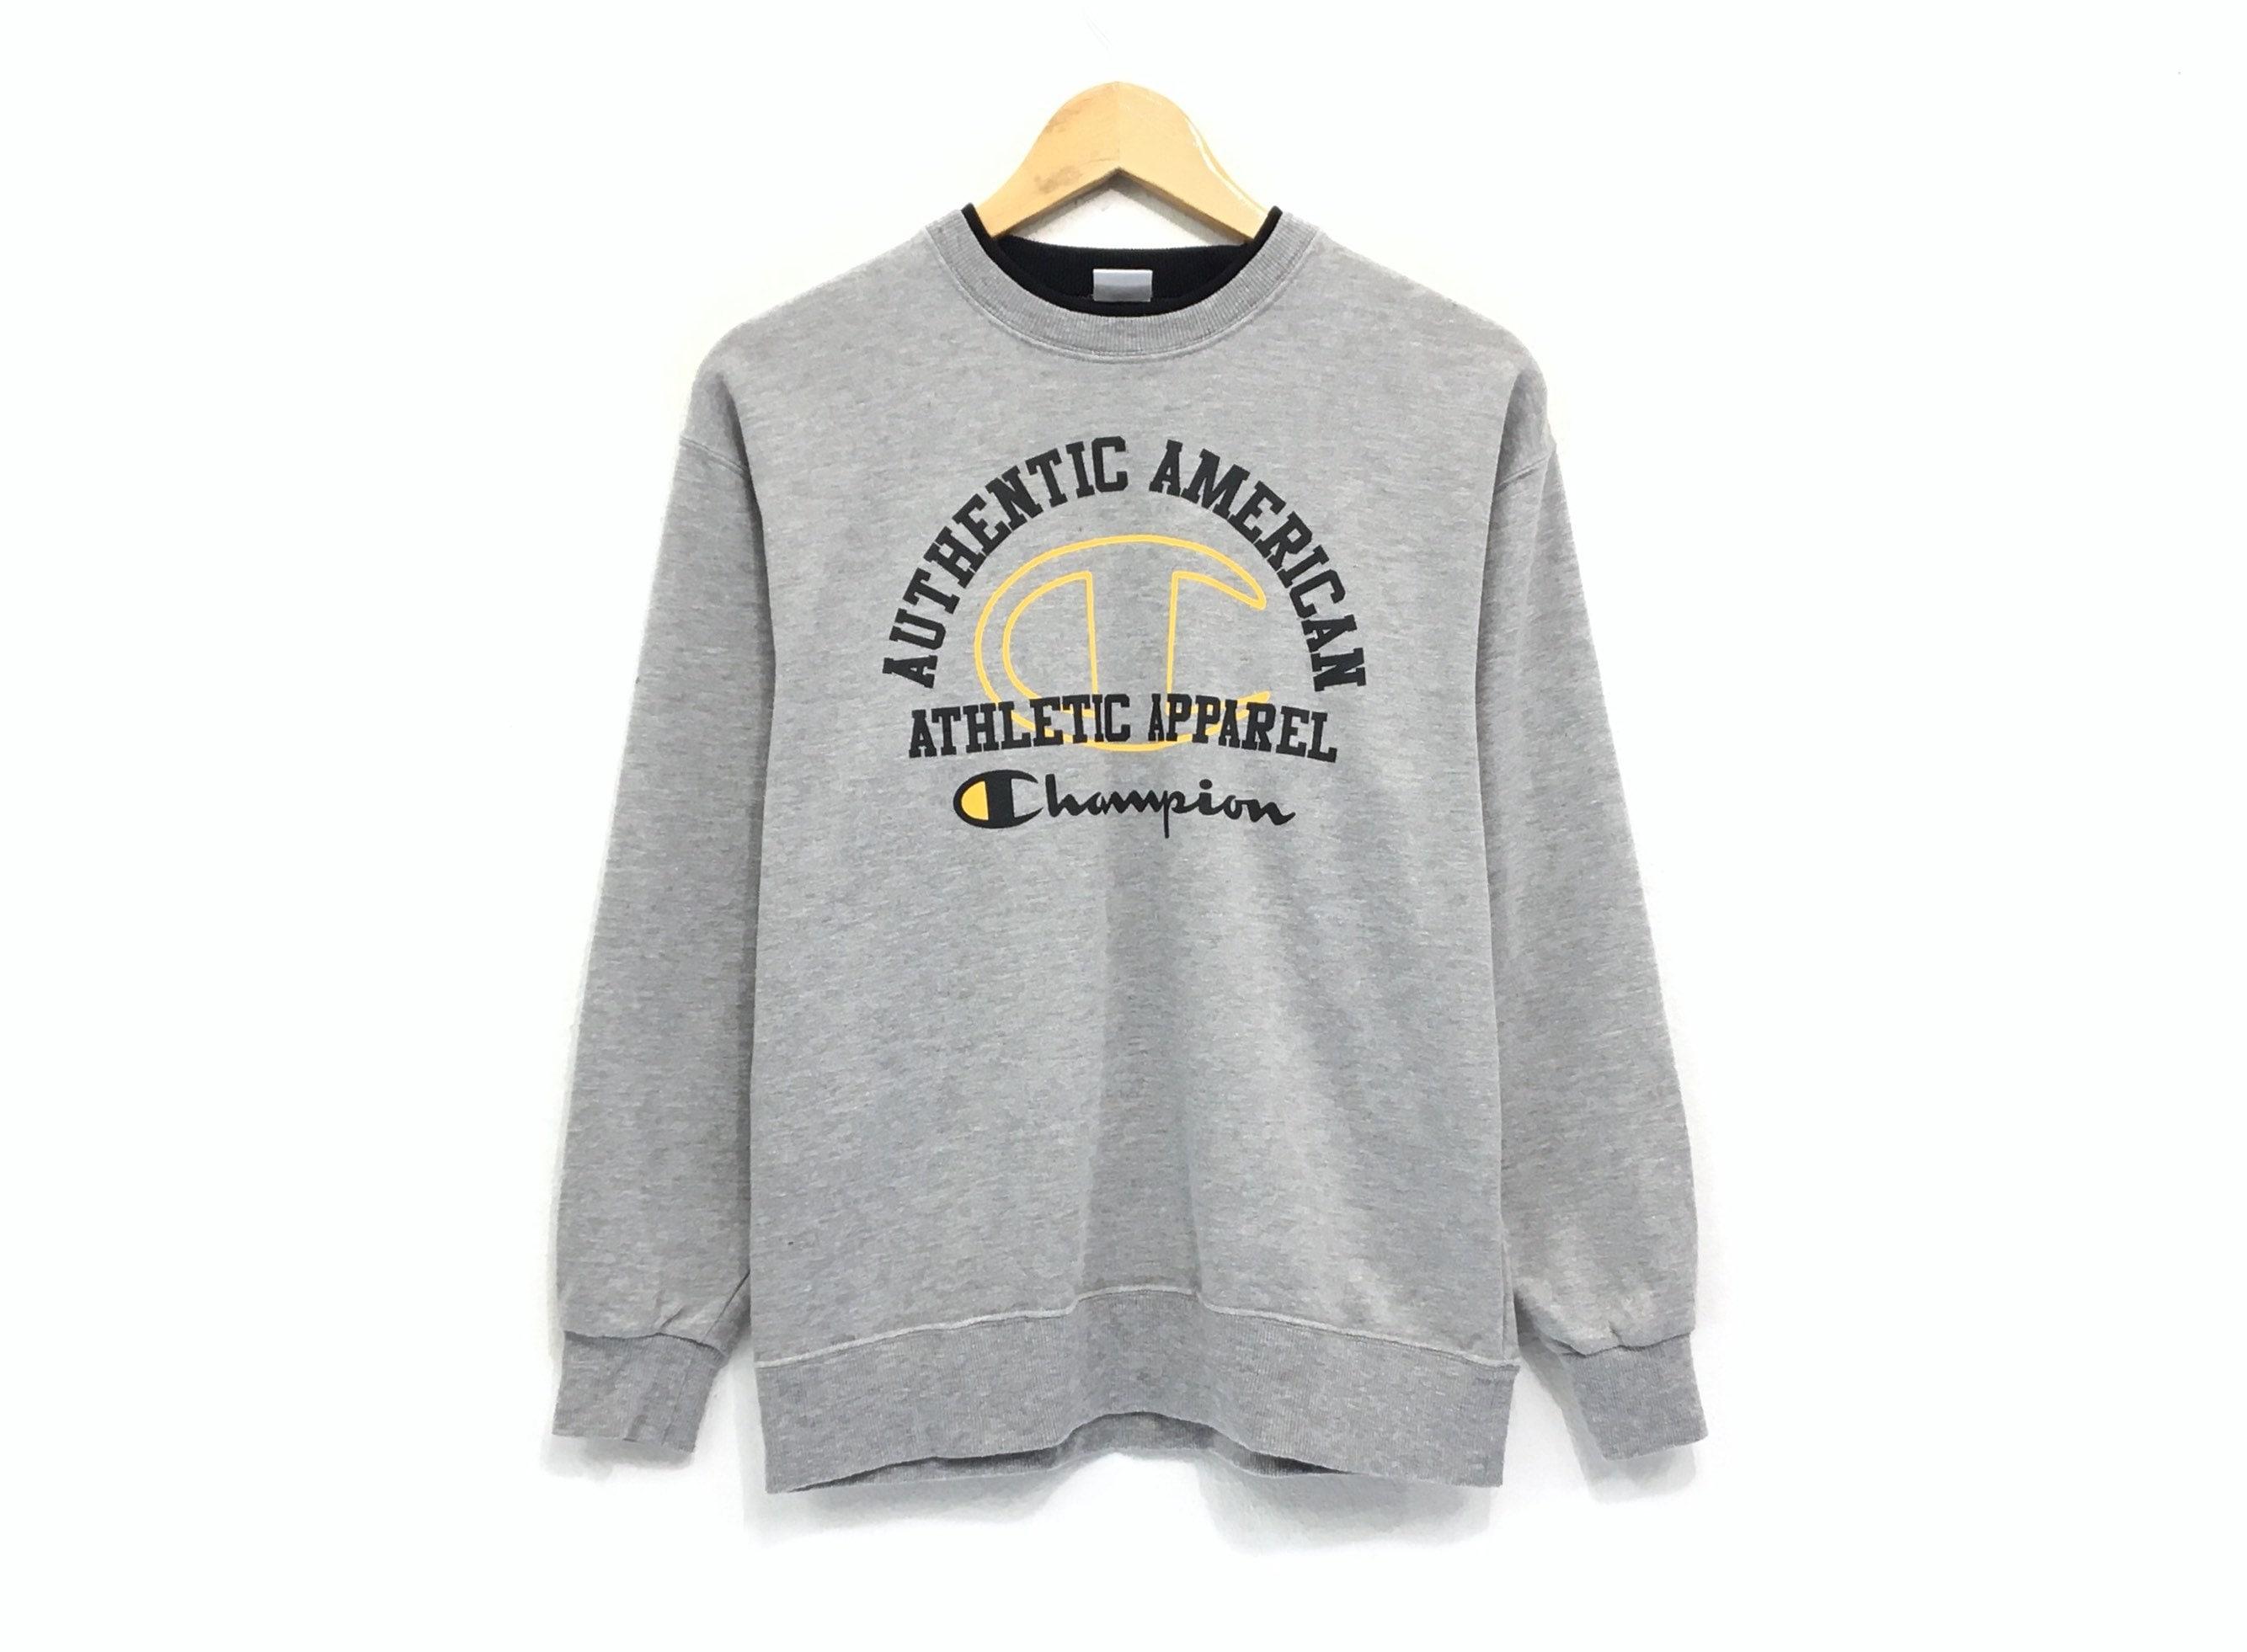 7526ceff5b8e Champion Crewneck Sweatshirt Jumper Big Logo Spell Out